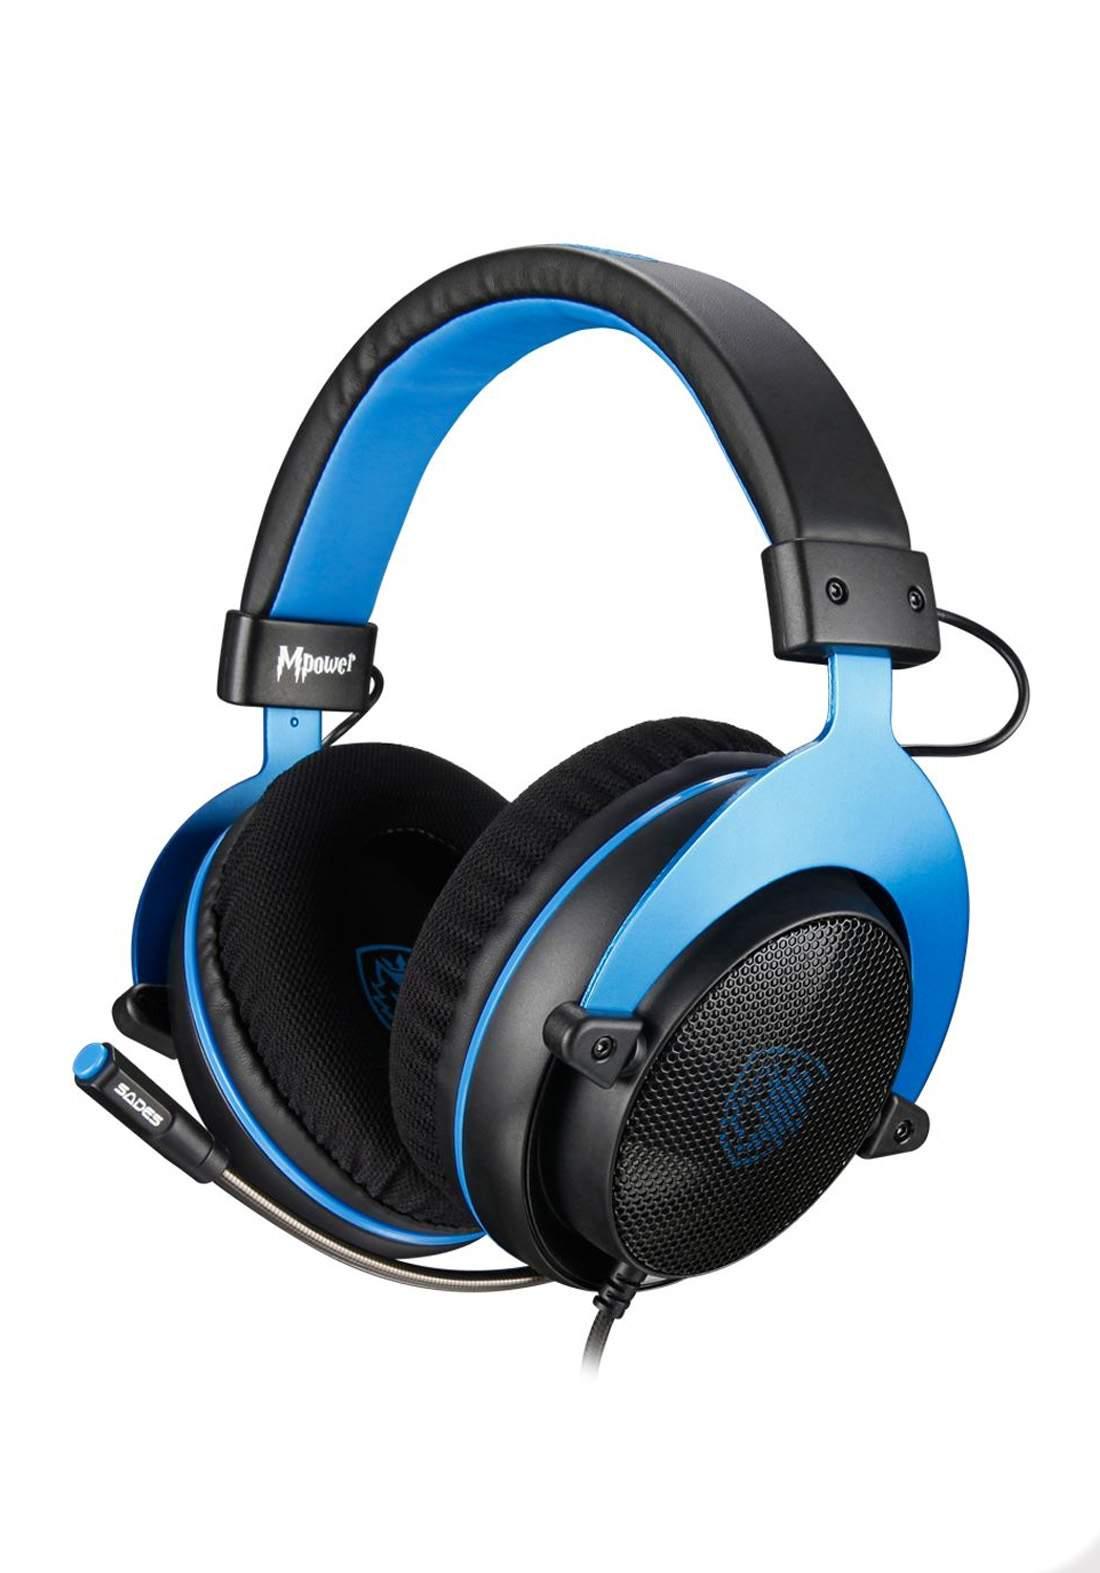 Sades MPower Wired Gaming Headphones - Pink سماعة